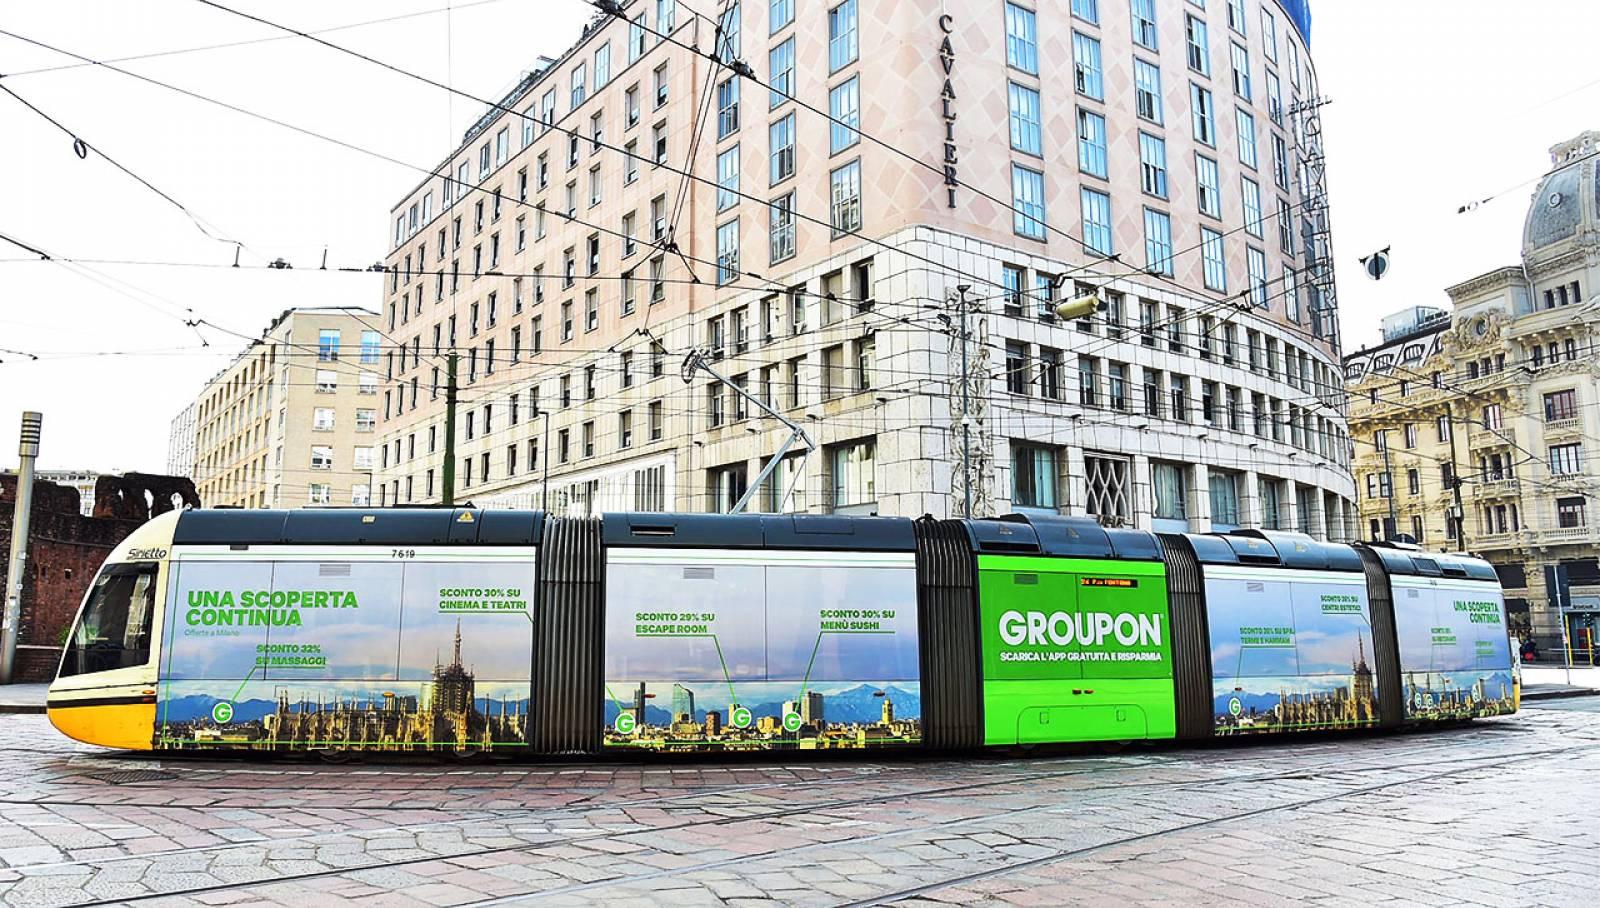 Pubblicità su tram IGPDecaux Milano Full-Wrap per Groupon